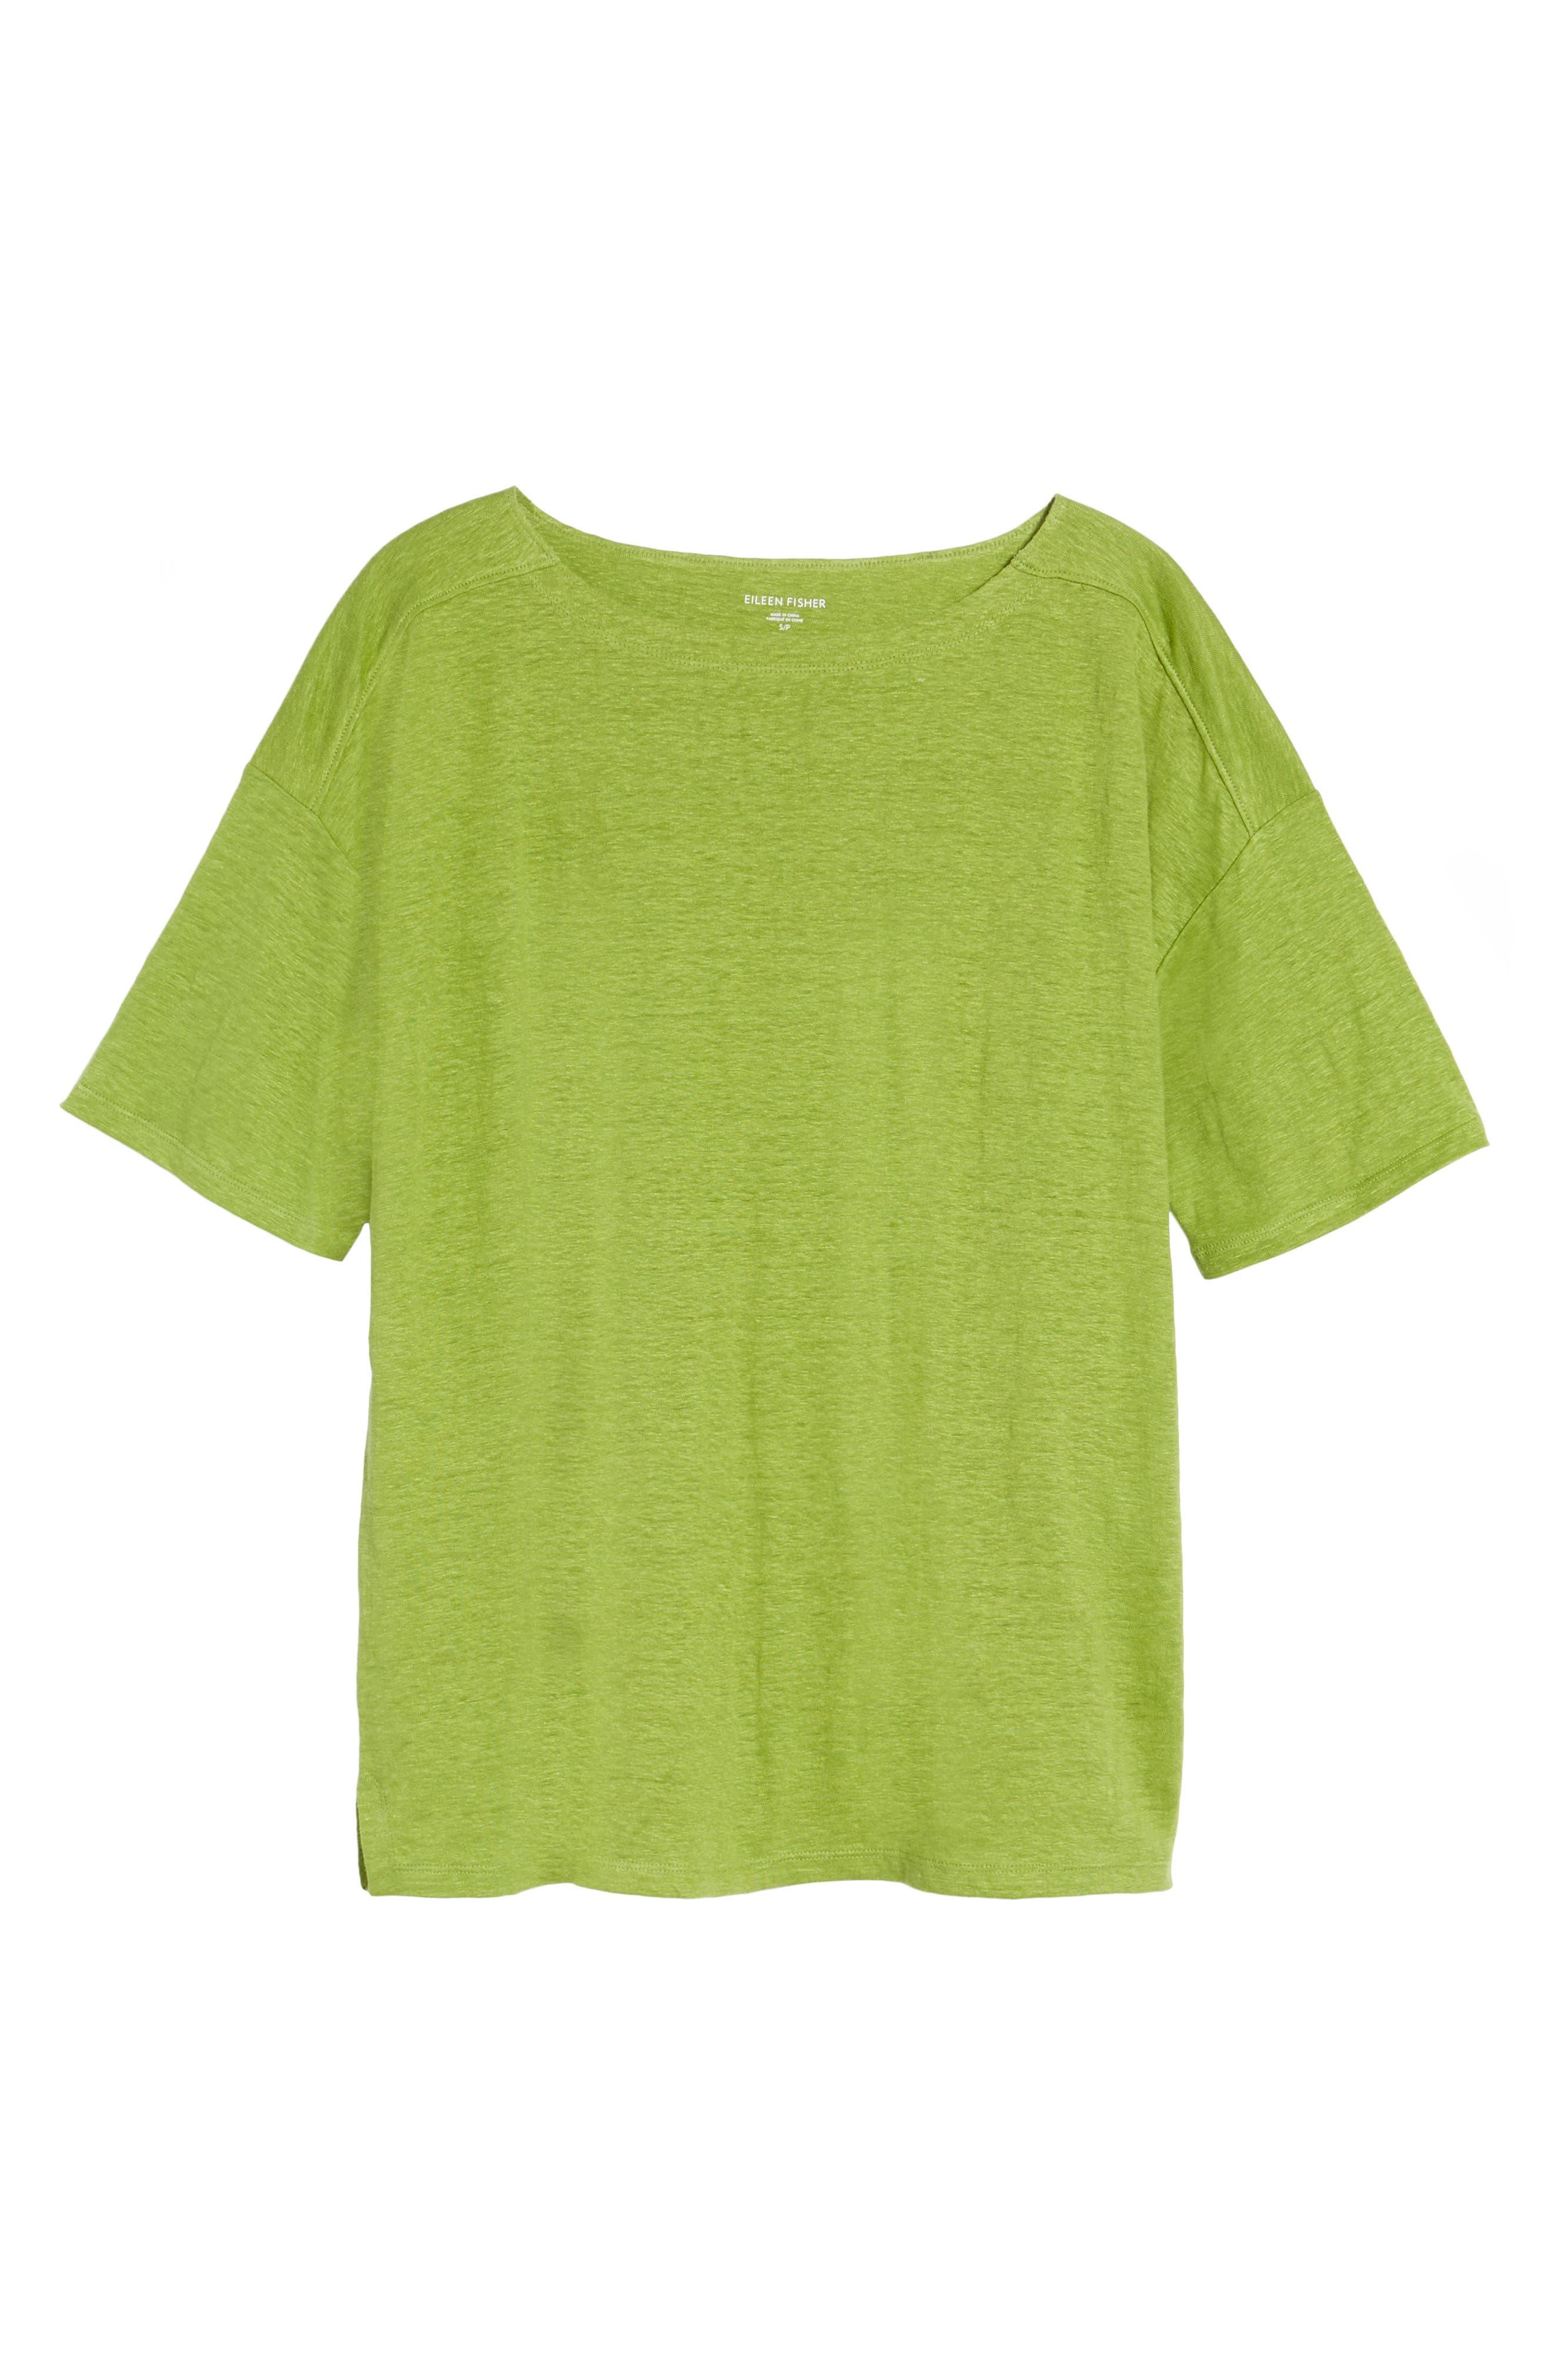 Slouchy Organic Linen Top,                             Alternate thumbnail 34, color,